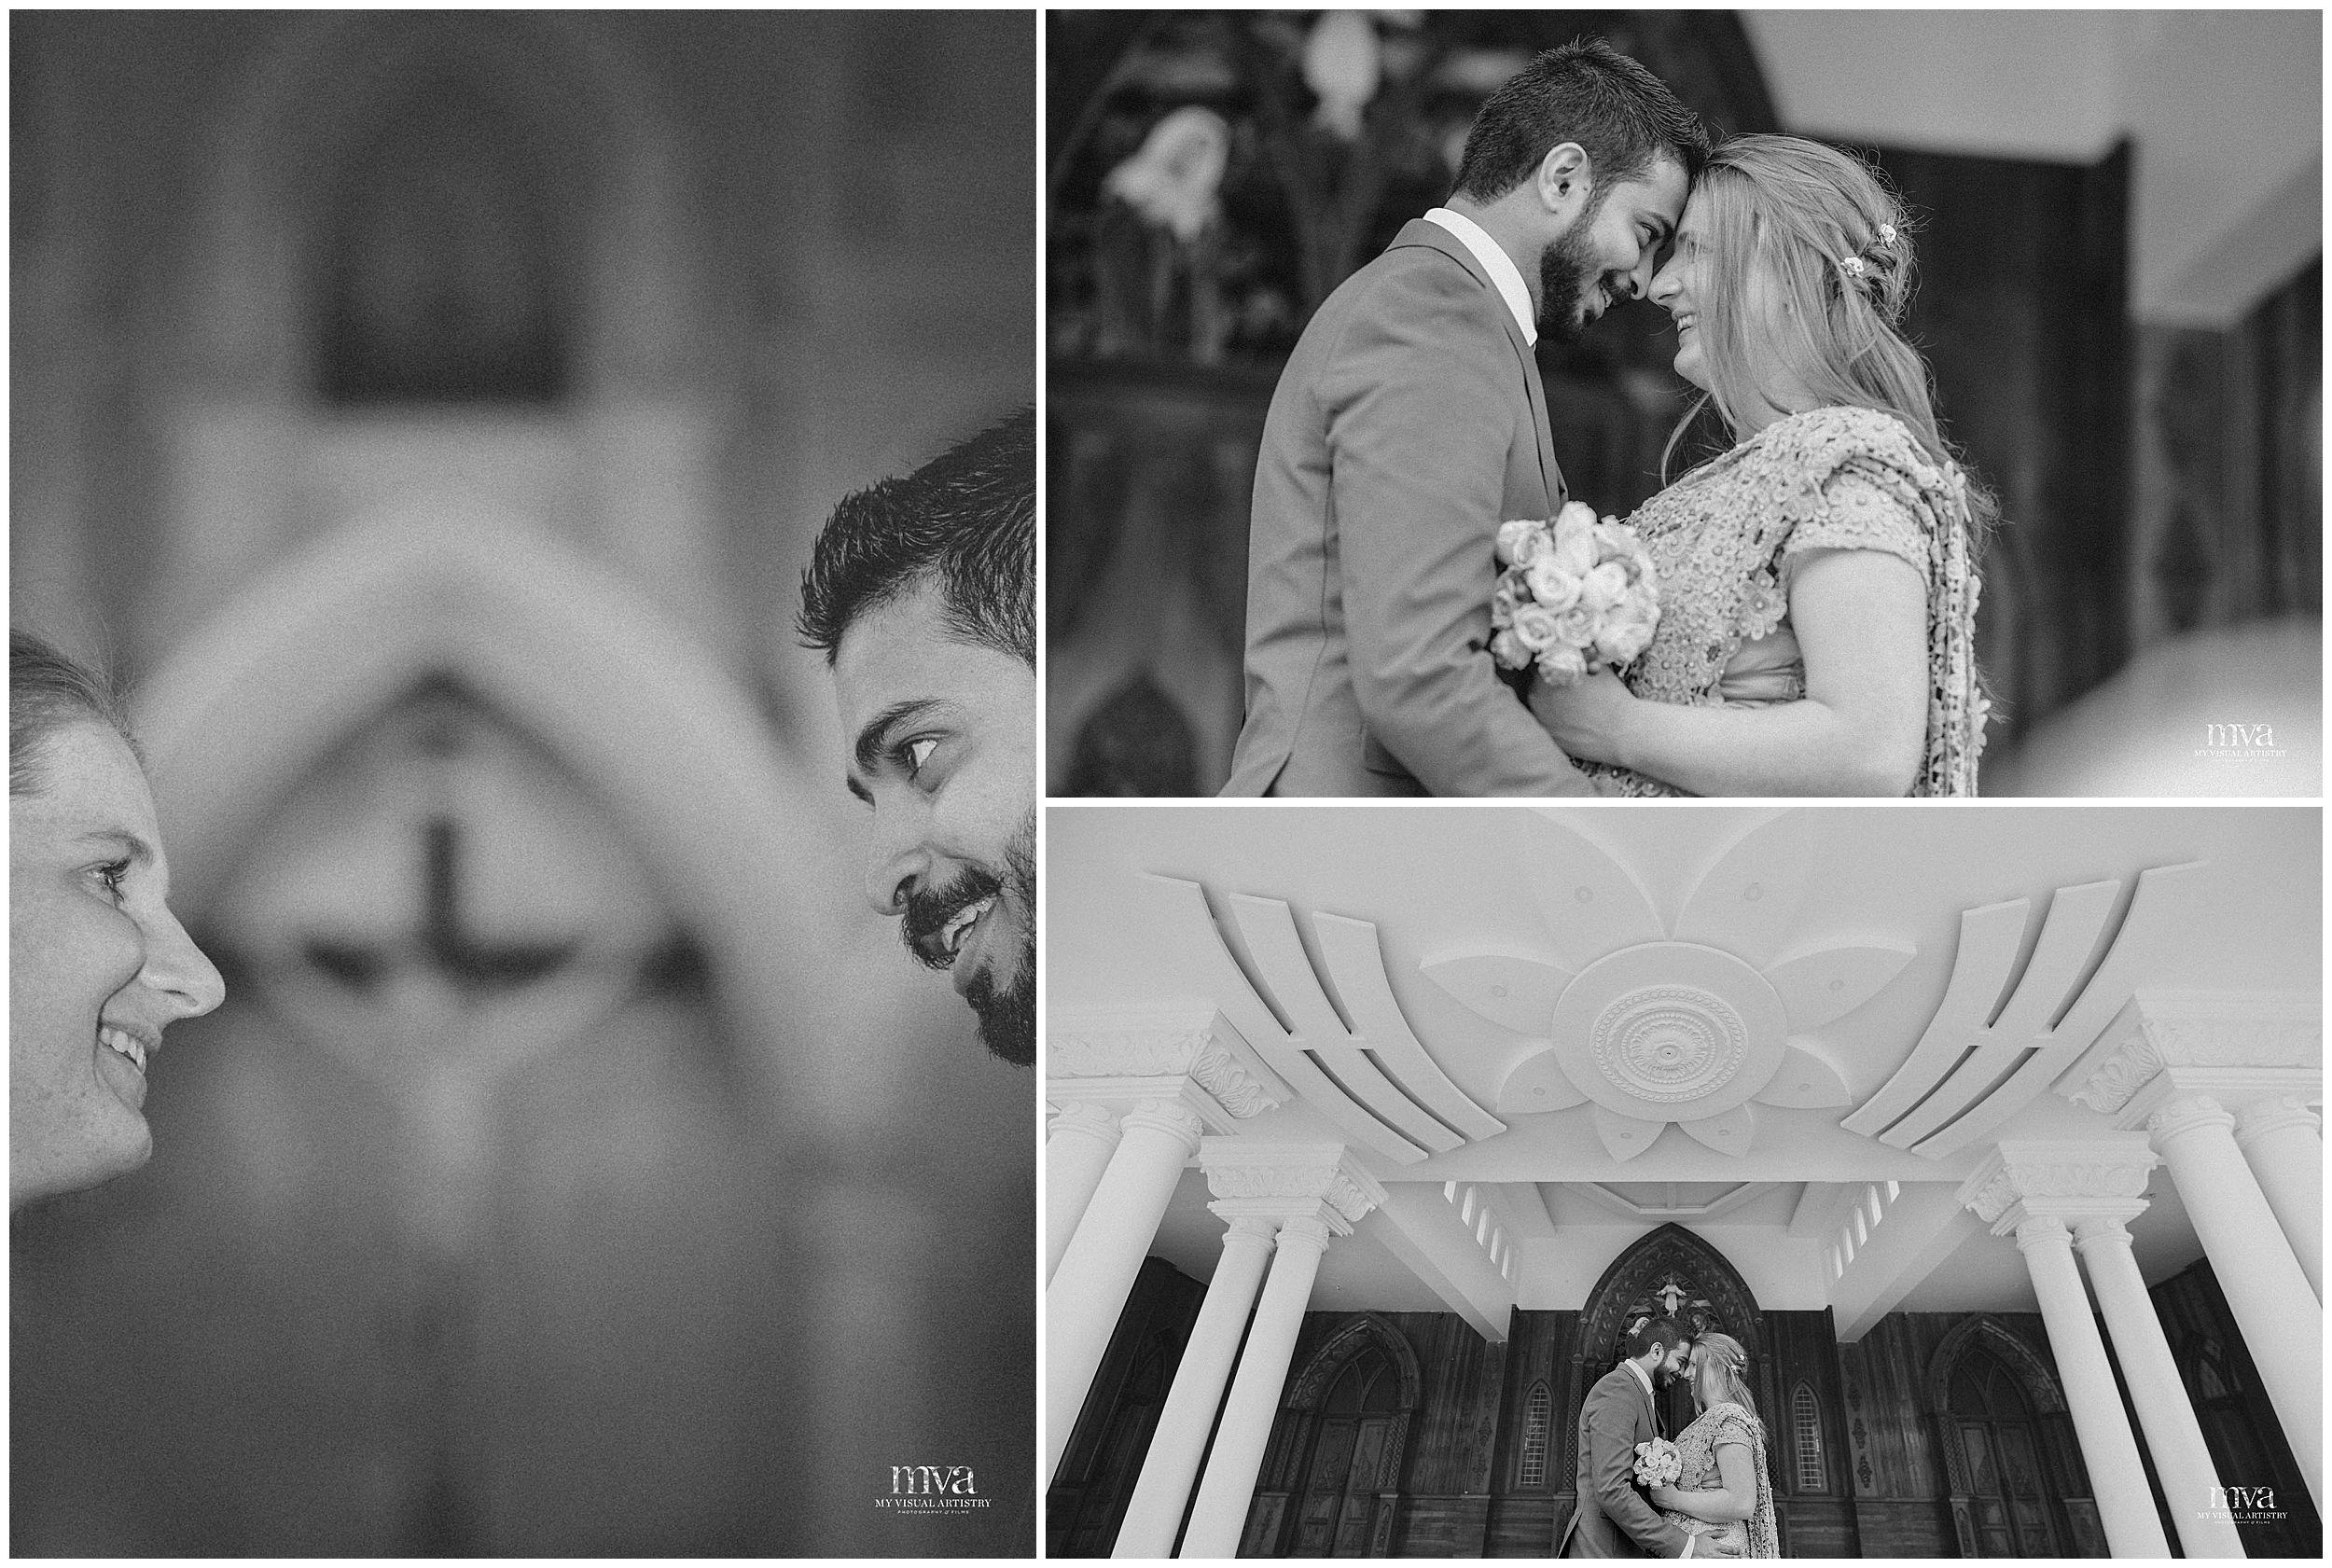 JOSEPH_LIDIA_MYVISUALARTISTRY_POLAND_WEDDING_PHOTOGRAPHER_MVA_JAIPUR_KERALA_MUNNAR_COCHIN_0024.jpg